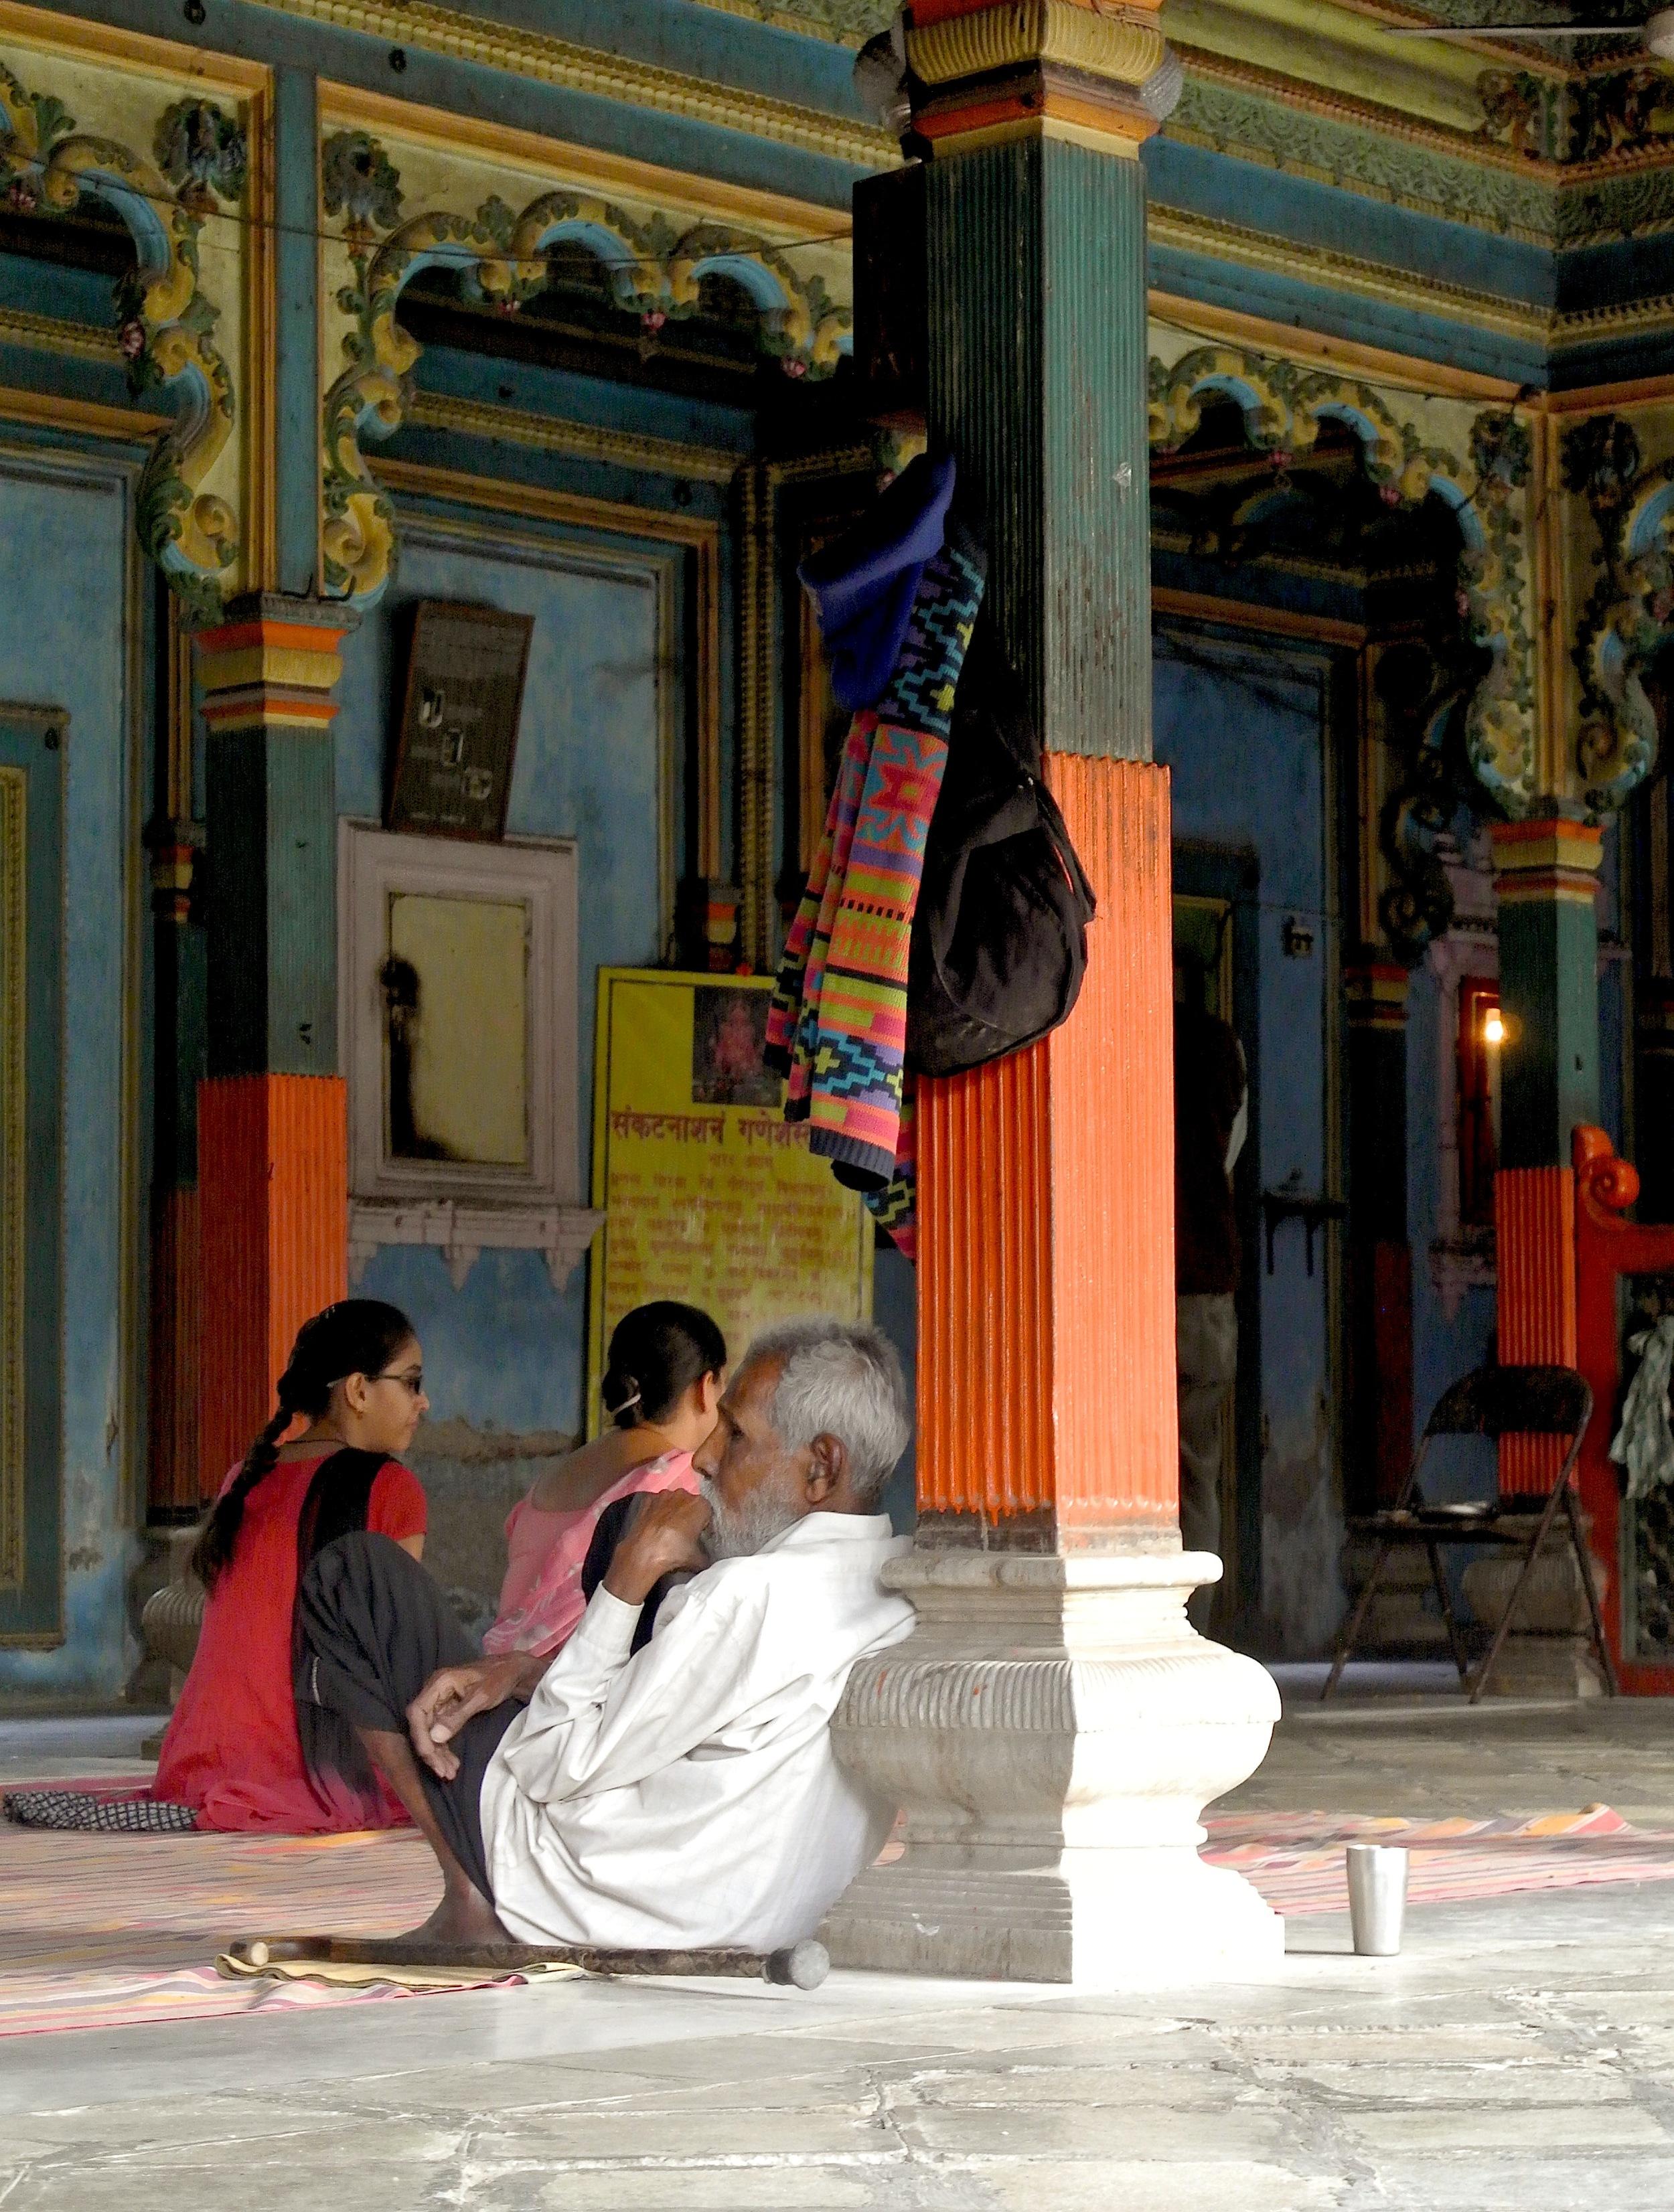 Worshippers inside a temple to Ganesha, the elephant-headed Hindu deity